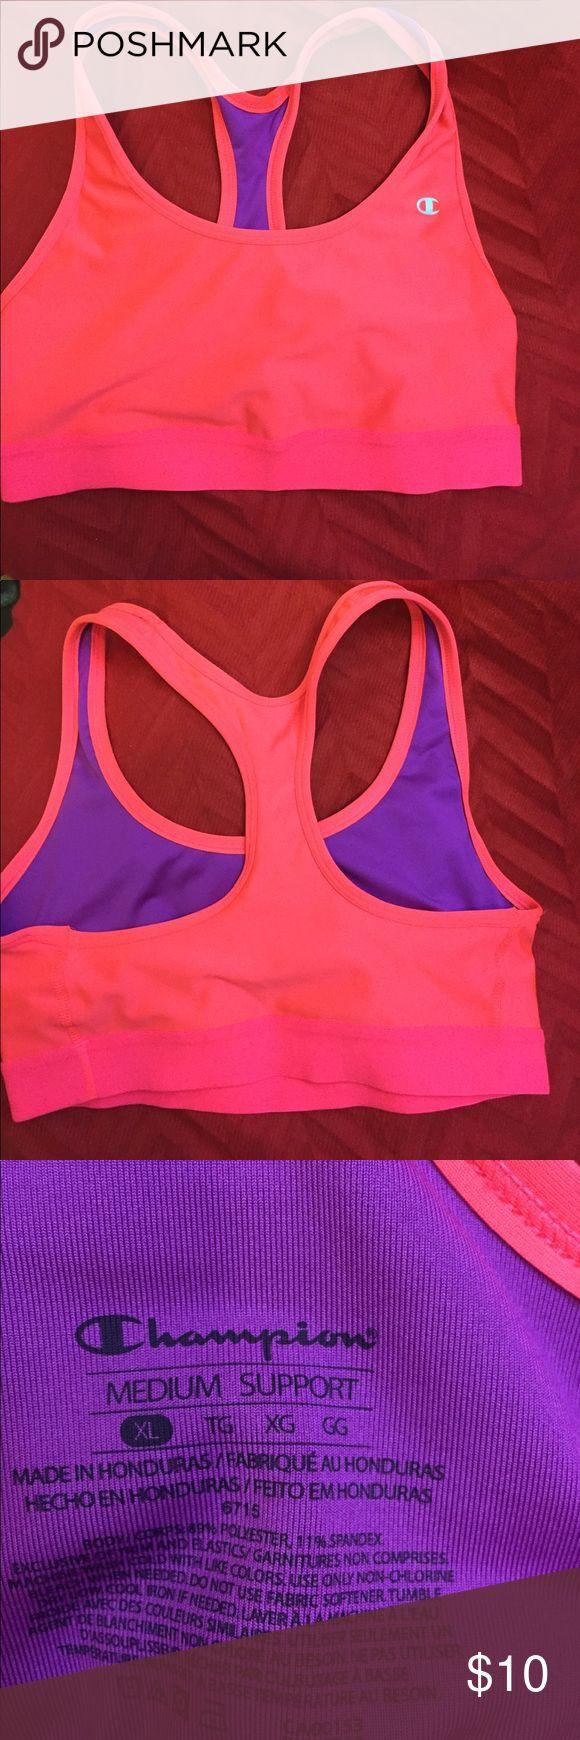 Sports bra Medium Support brand new Champion sport bras  XL Brand New Champion Intimates & Sleepwear Bras